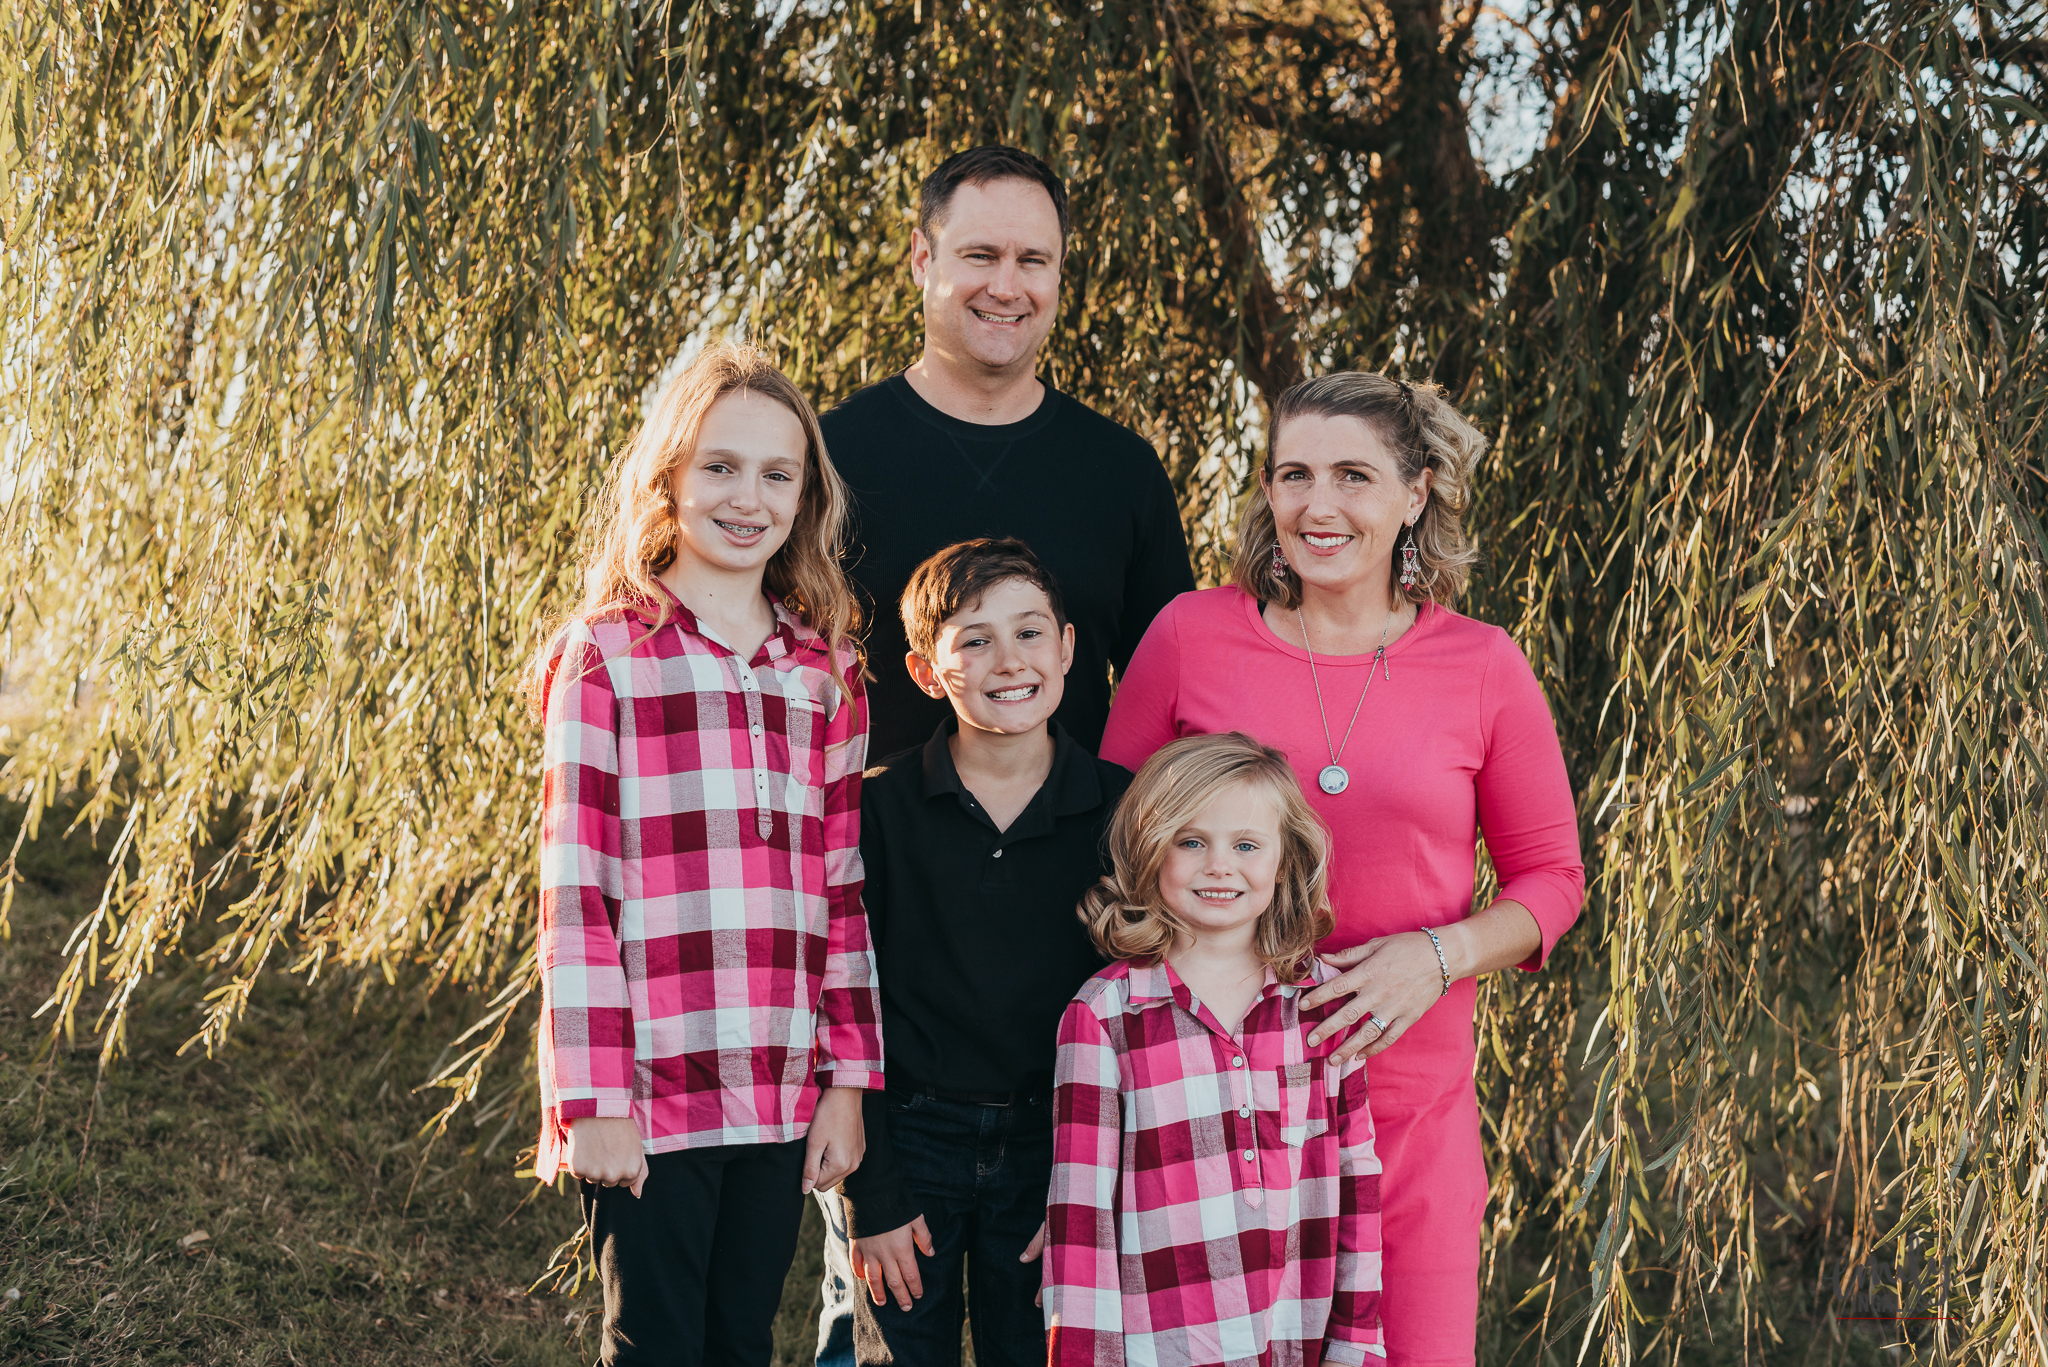 Family Photographer_Round Rock Photographer_Emily Ingalls Photography_Austin Photographer_Pflugerville Photographer_Georgetown Photographer_Lake Pflugerville-16.jpg